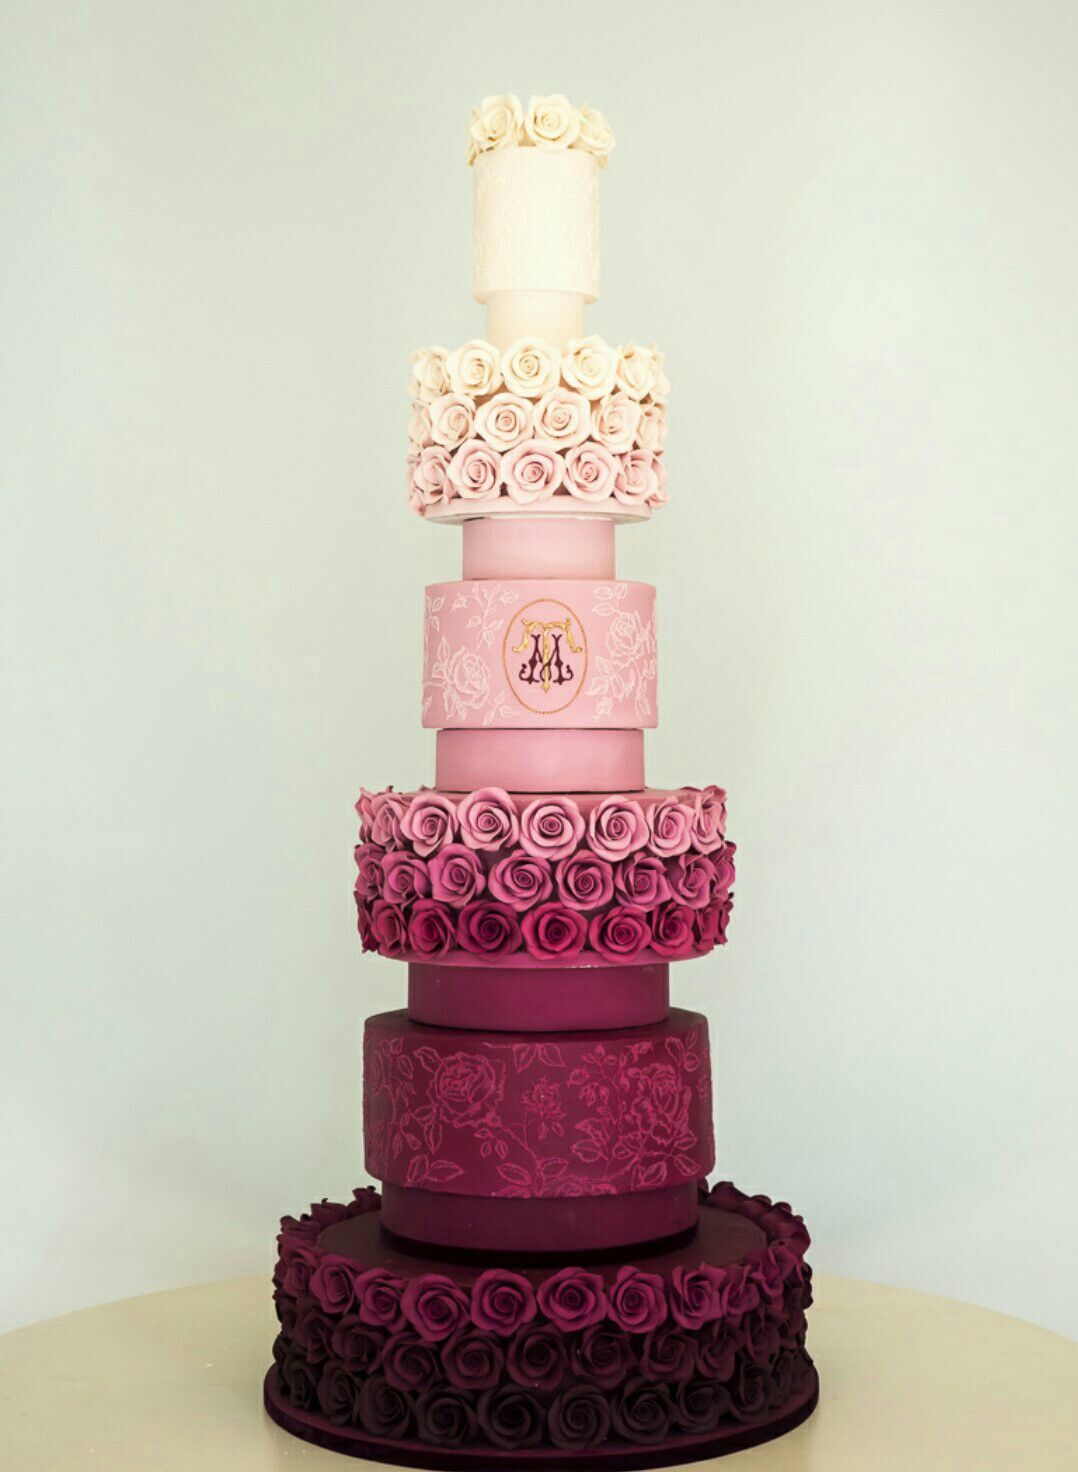 Pin de Chloe Crothers en Wedding | Pinterest